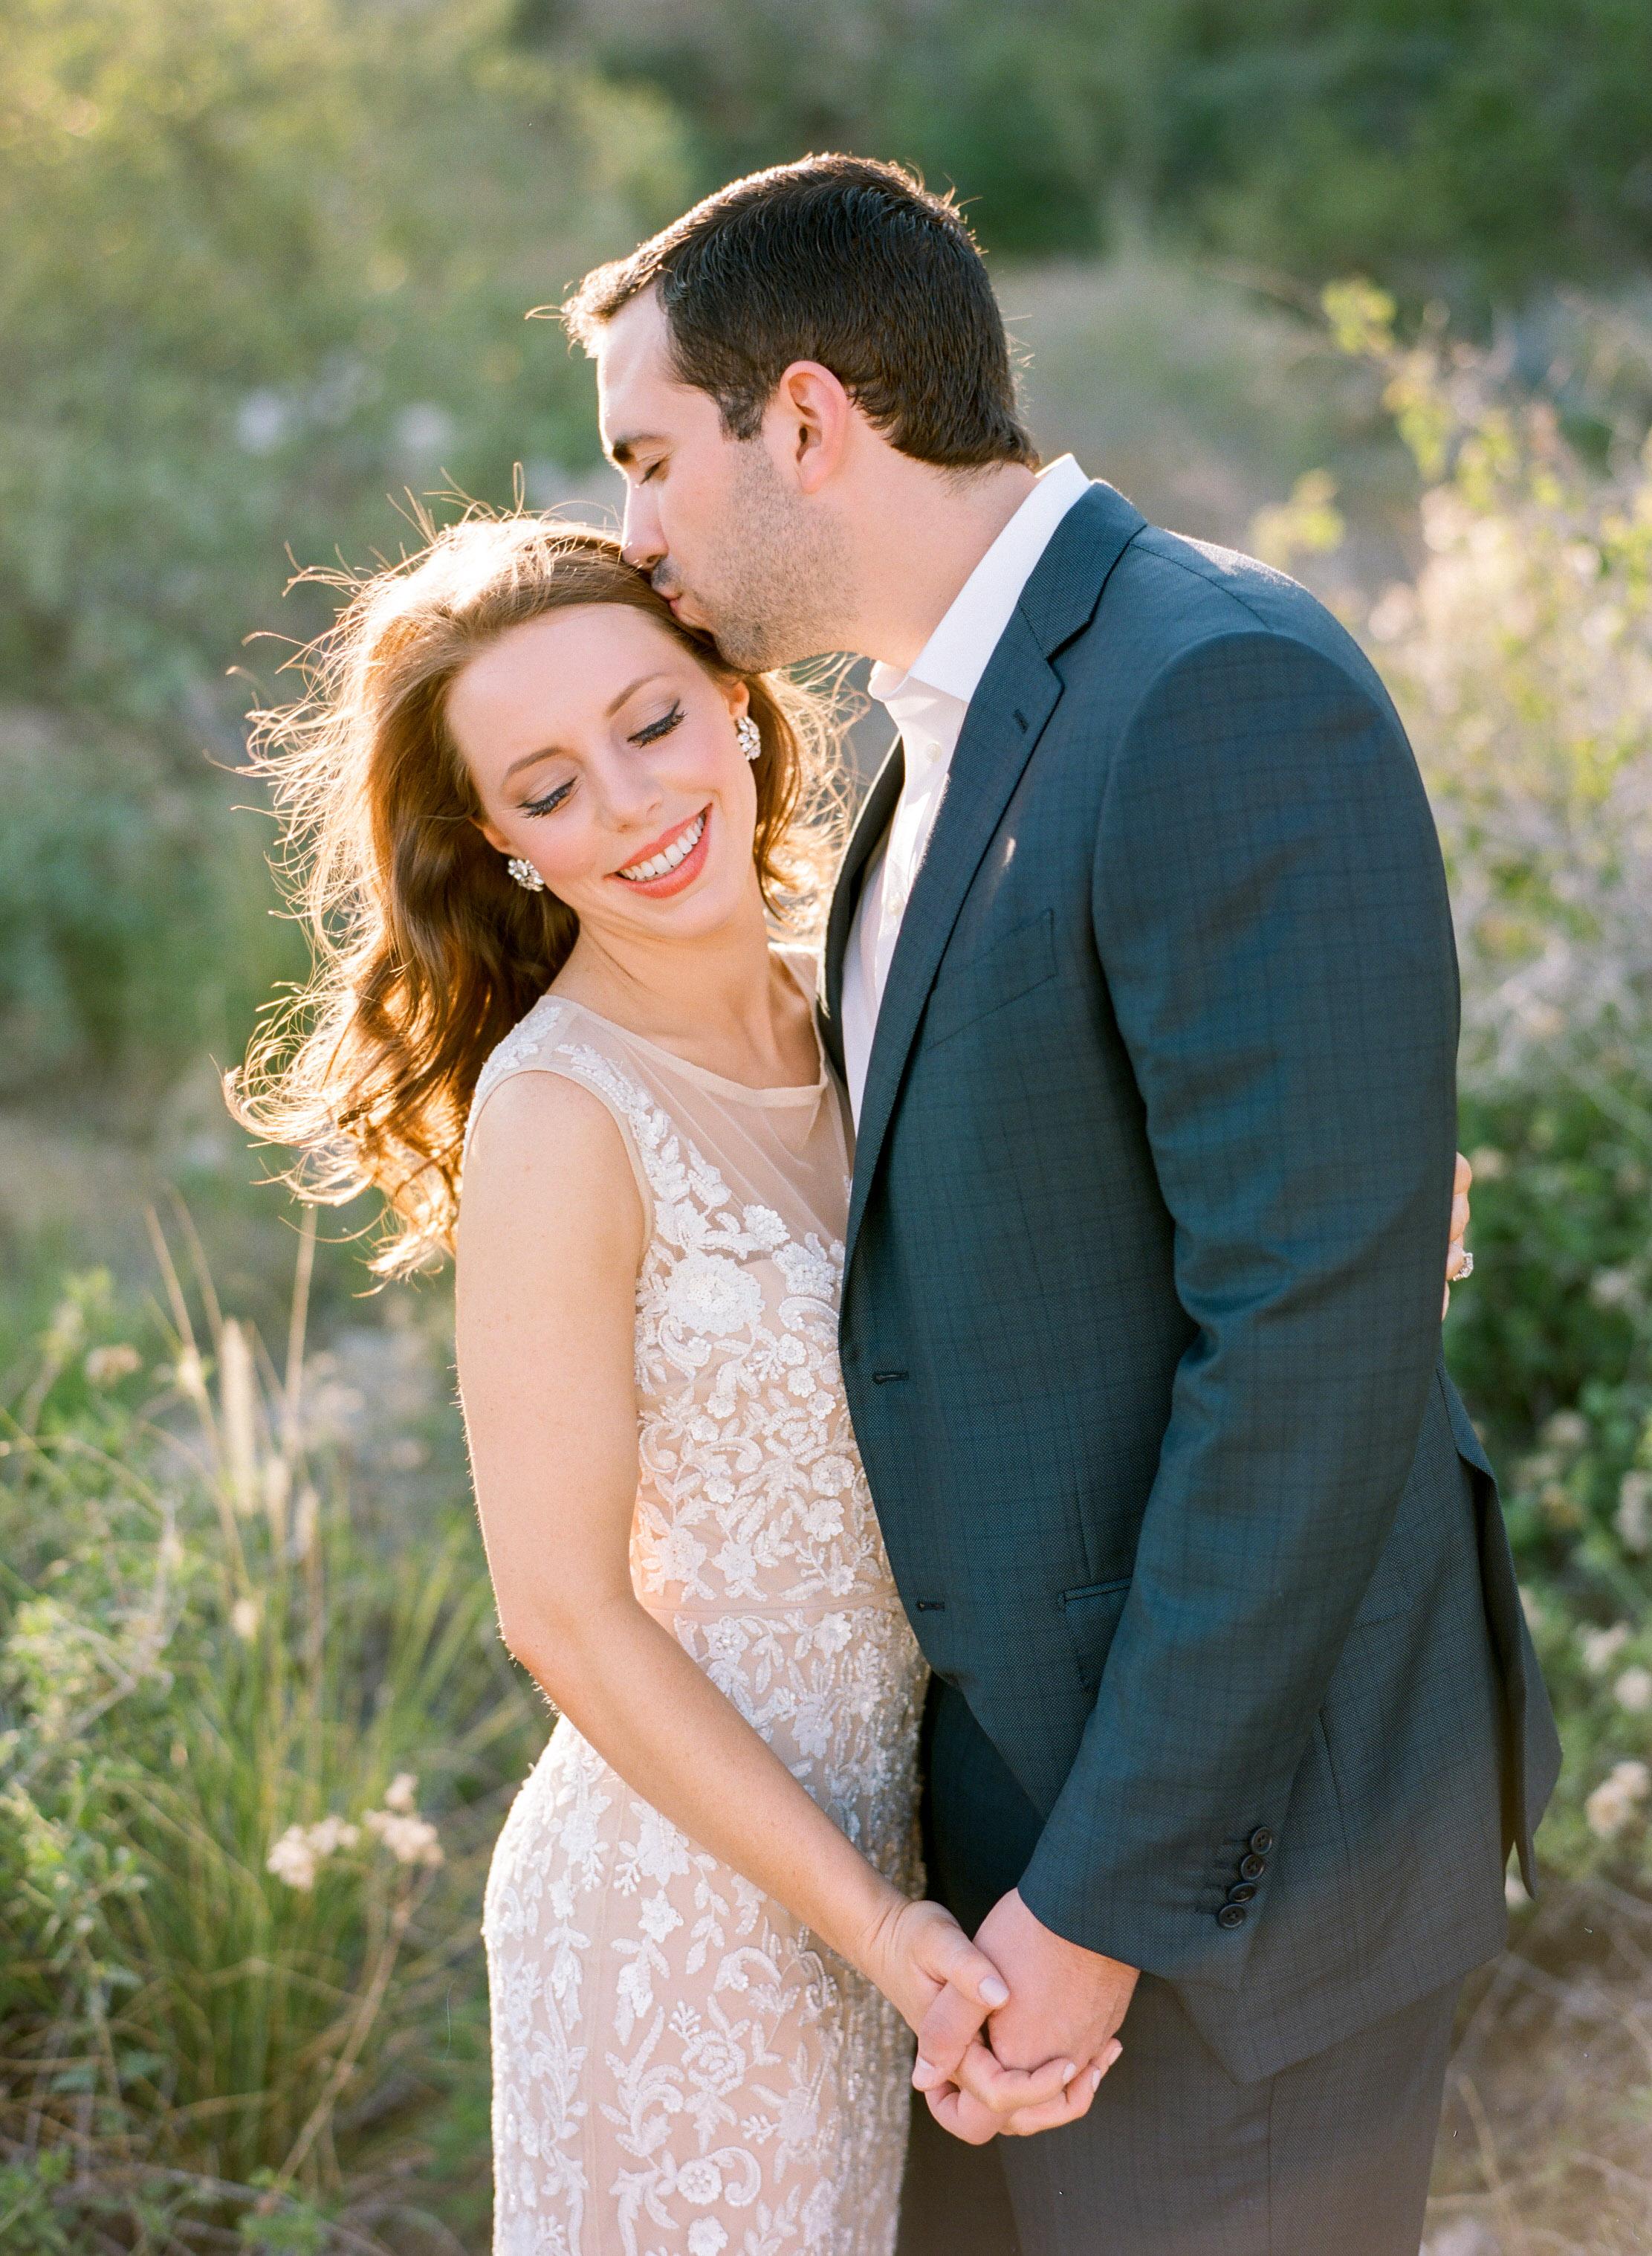 Dana-Fernandez-Photography-Destination-Wedding-Photographer-Cabo-San-Lucas-Film-Houston-Texas-Cabo-5.jpg